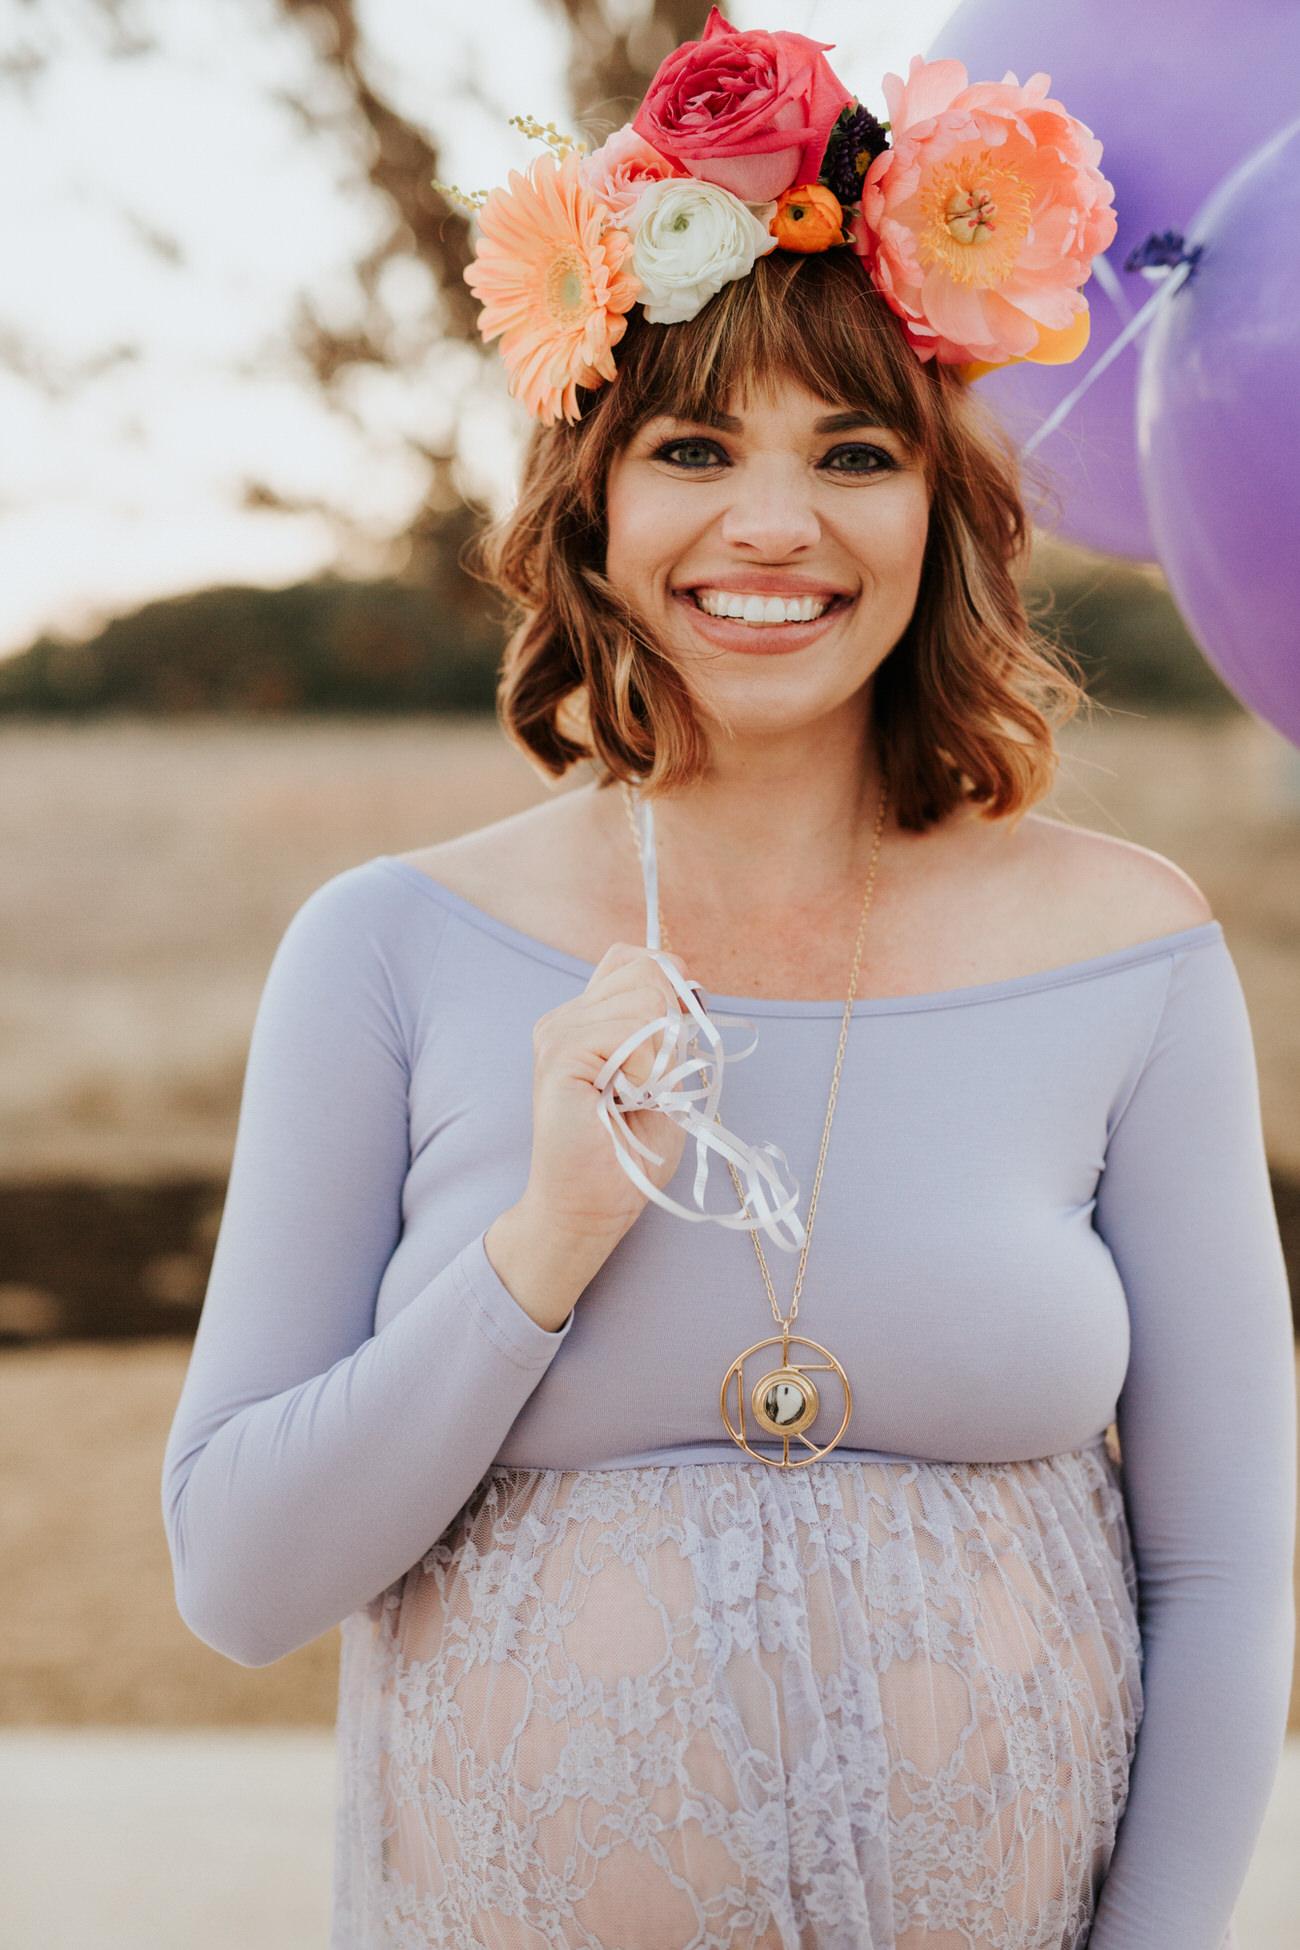 Beautiful pregnant woman at ultraviolet maternity shoot